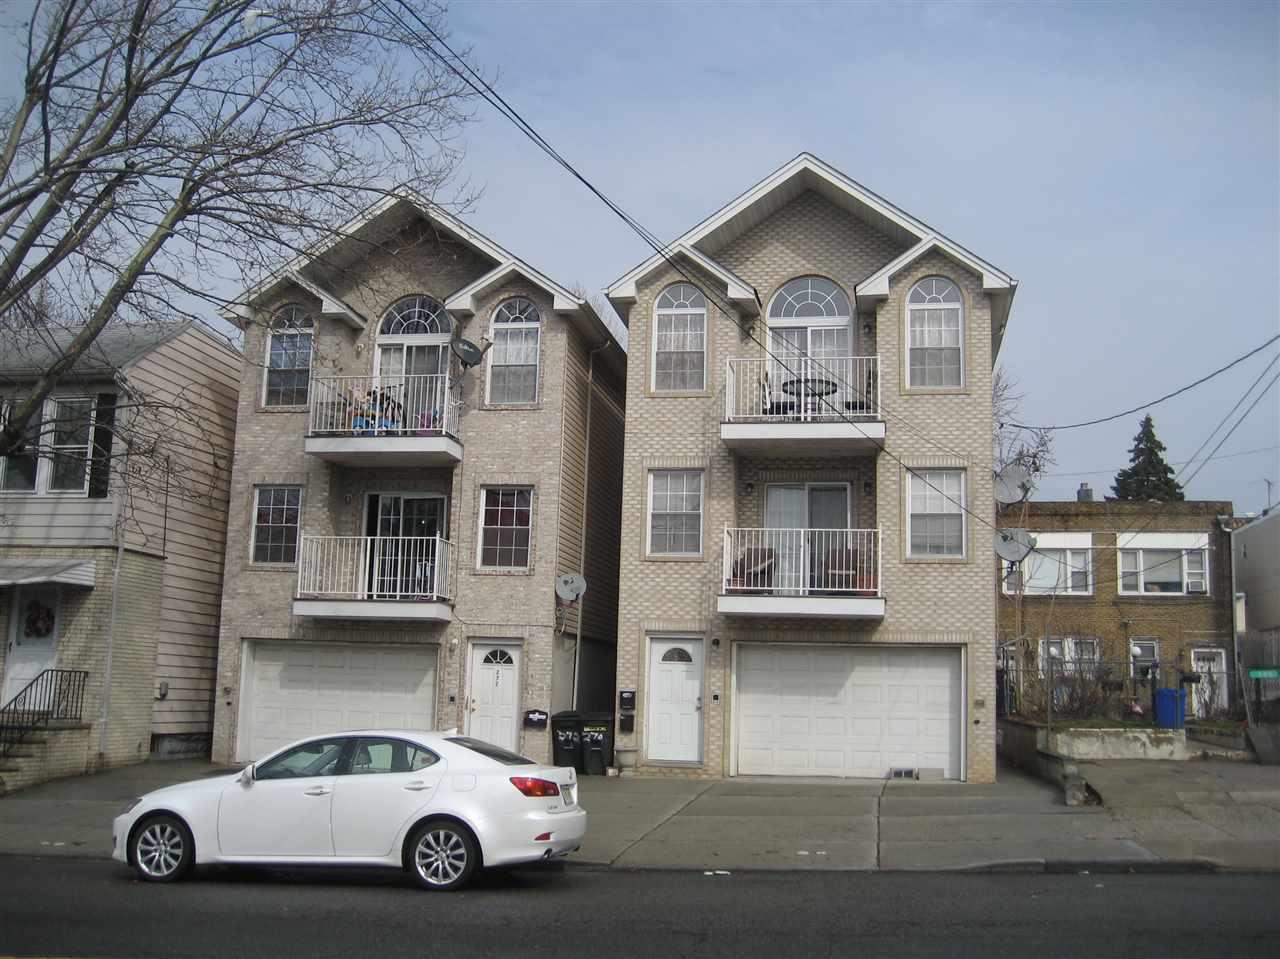 272 DANFORTH AVE, JC, West Bergen, NJ 07305